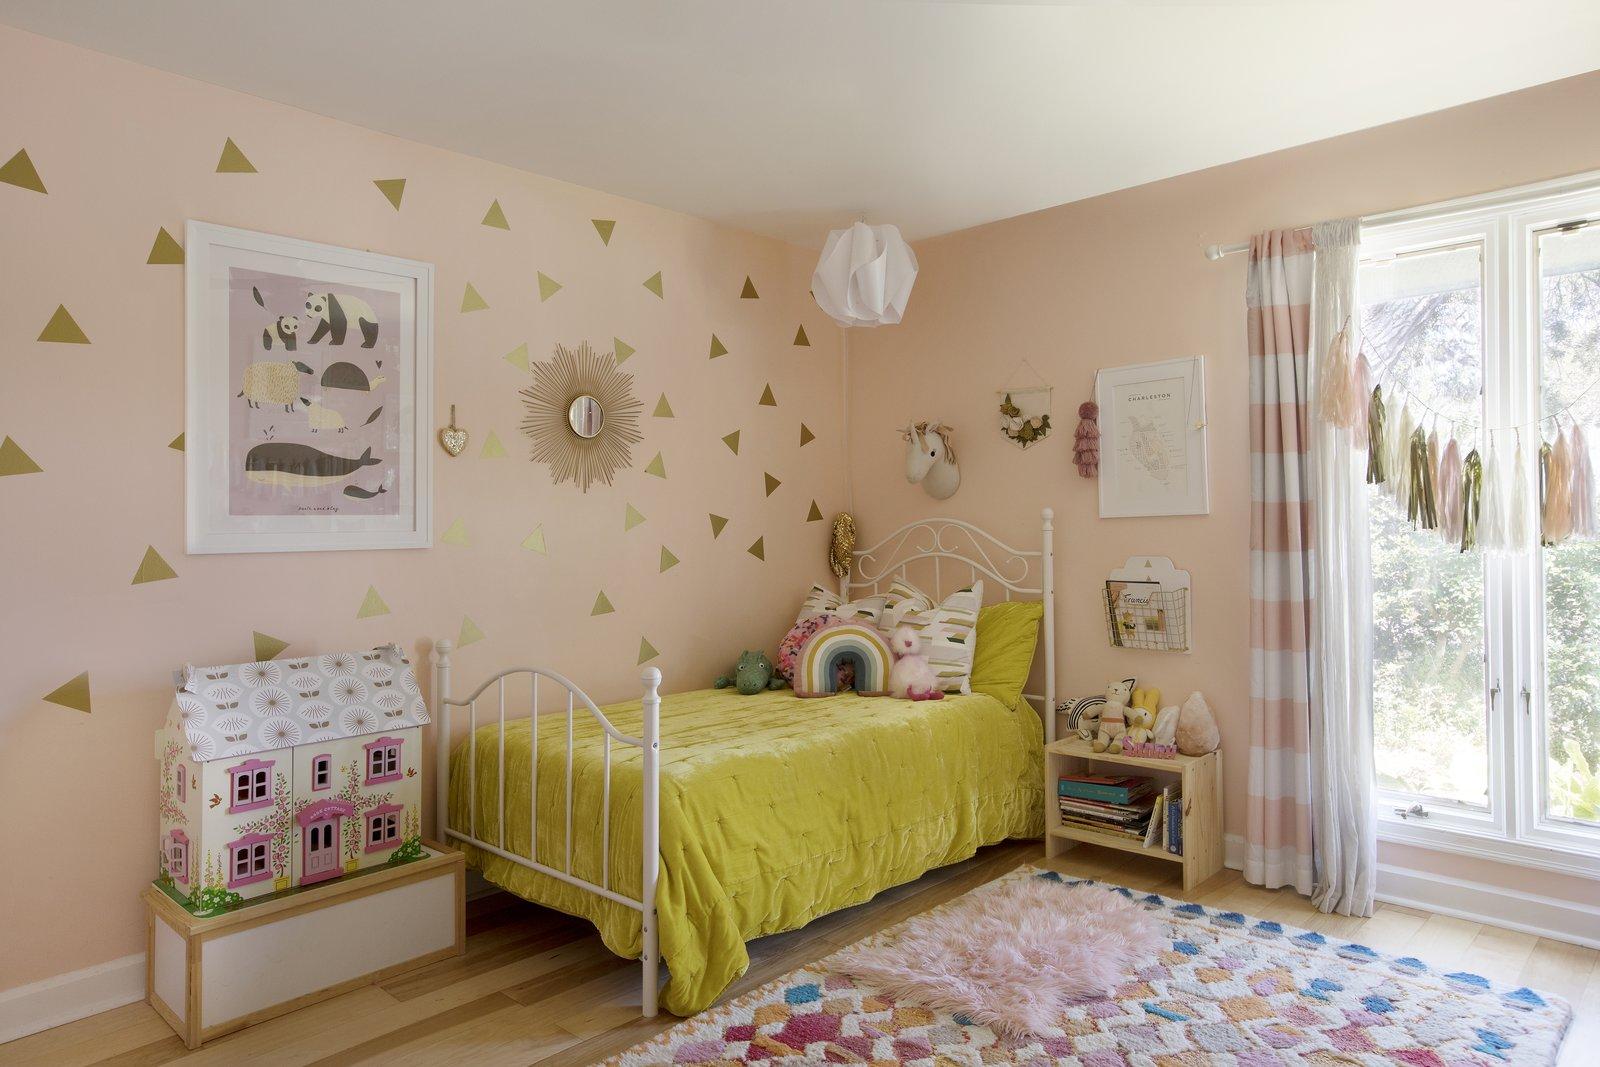 Sunwoven Studios Erin Barrett South Carolina home children's room